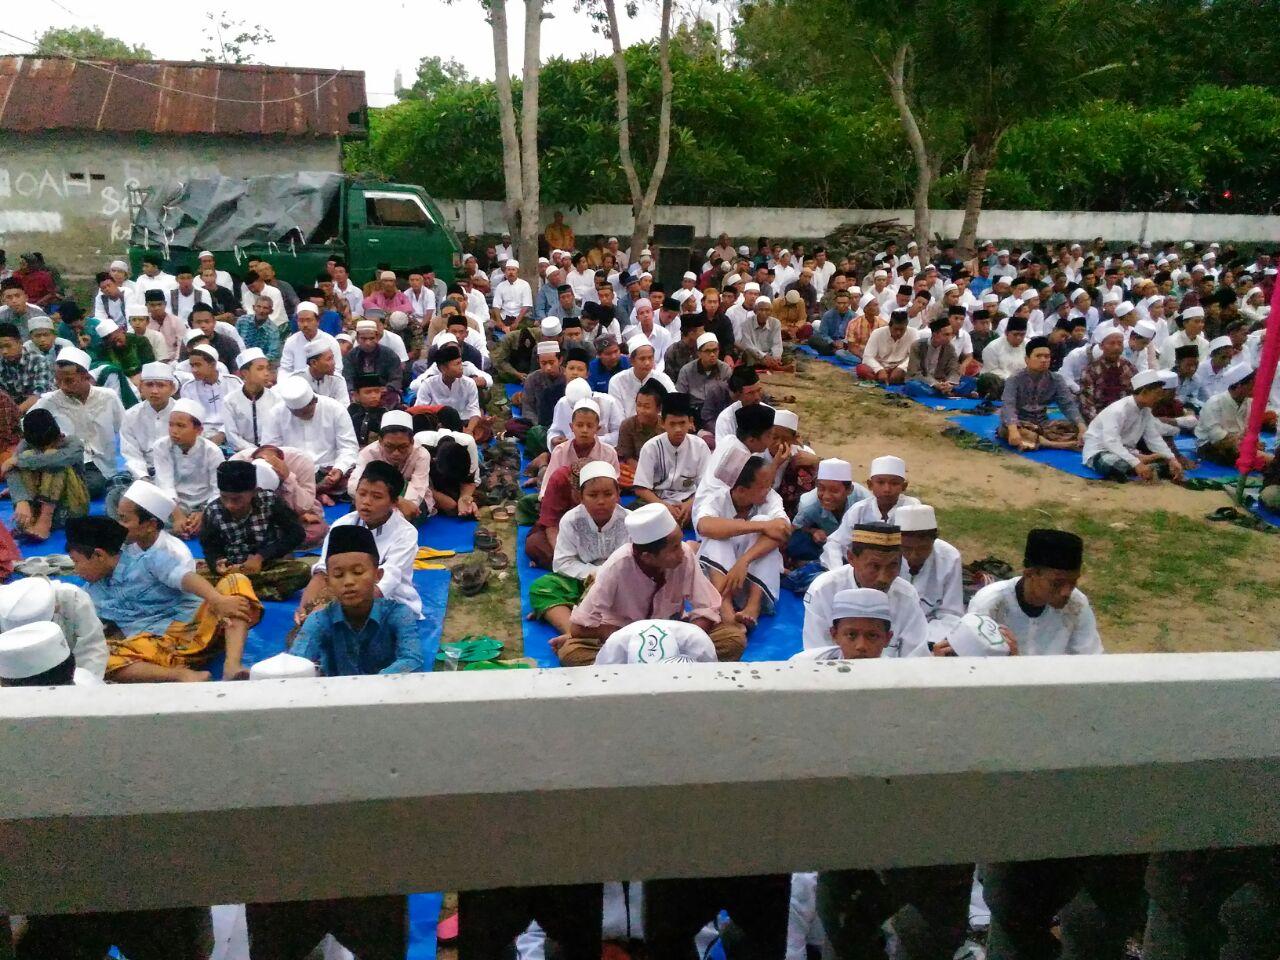 Gresik News 1 Lamongan Berita Gresiknews1 Haul Akbar Pondok Pesantren